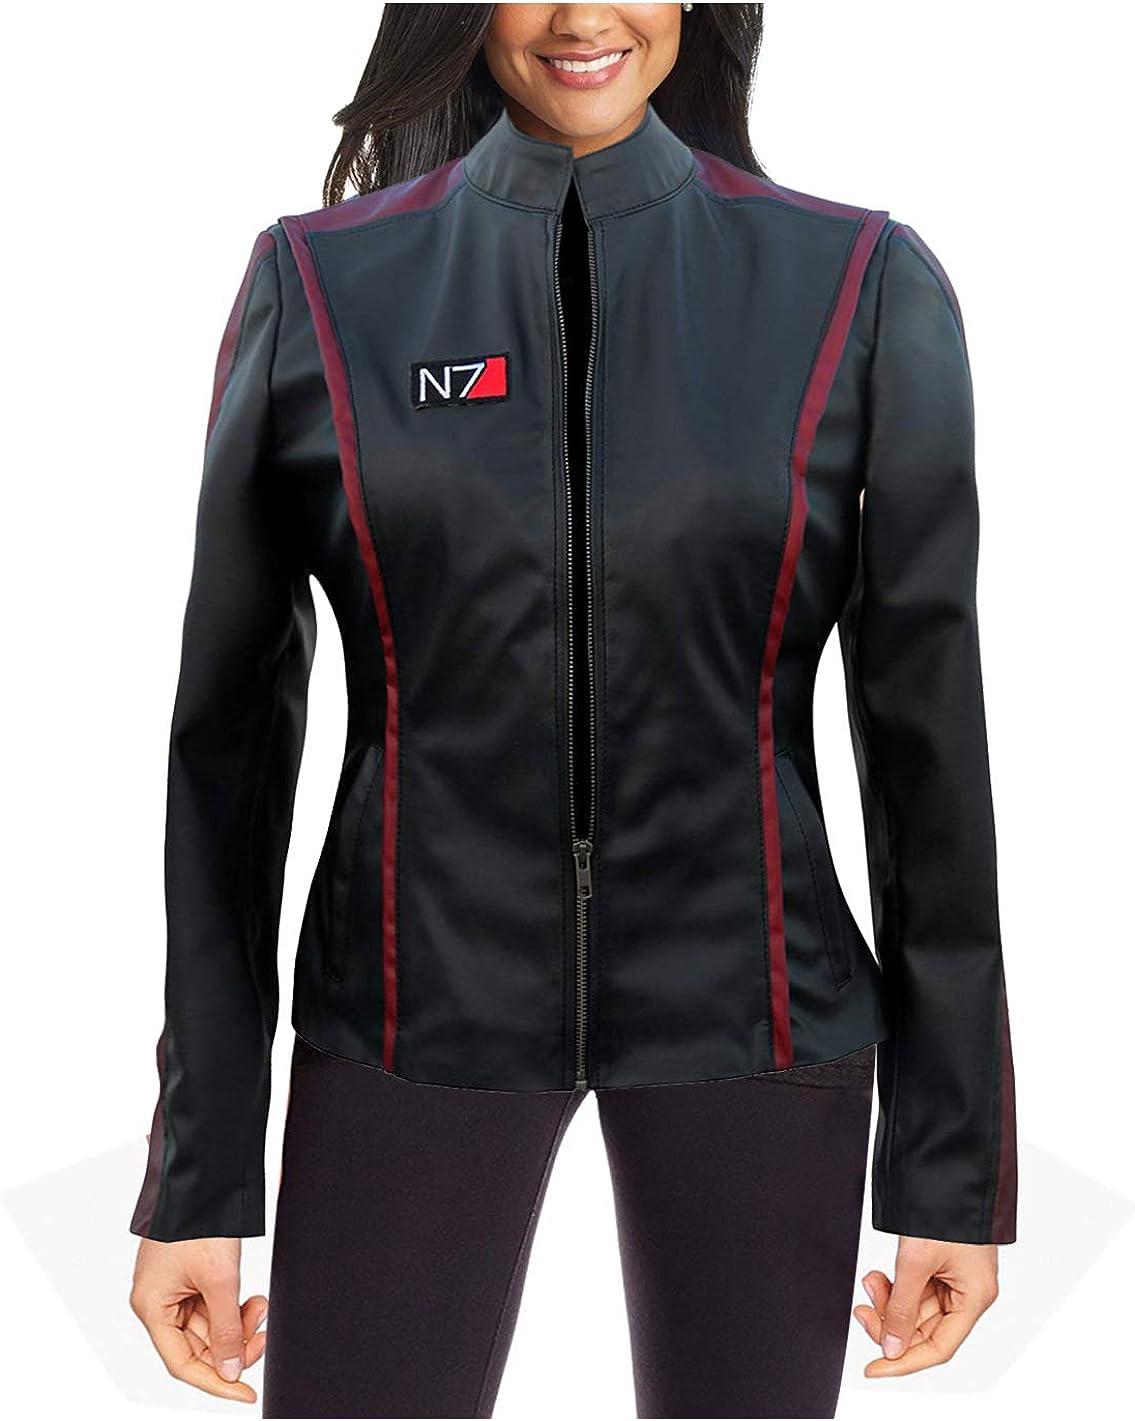 Women Gaming Effect Jacket - Red Stripes Girls Biker Black Leather Jacket for Women